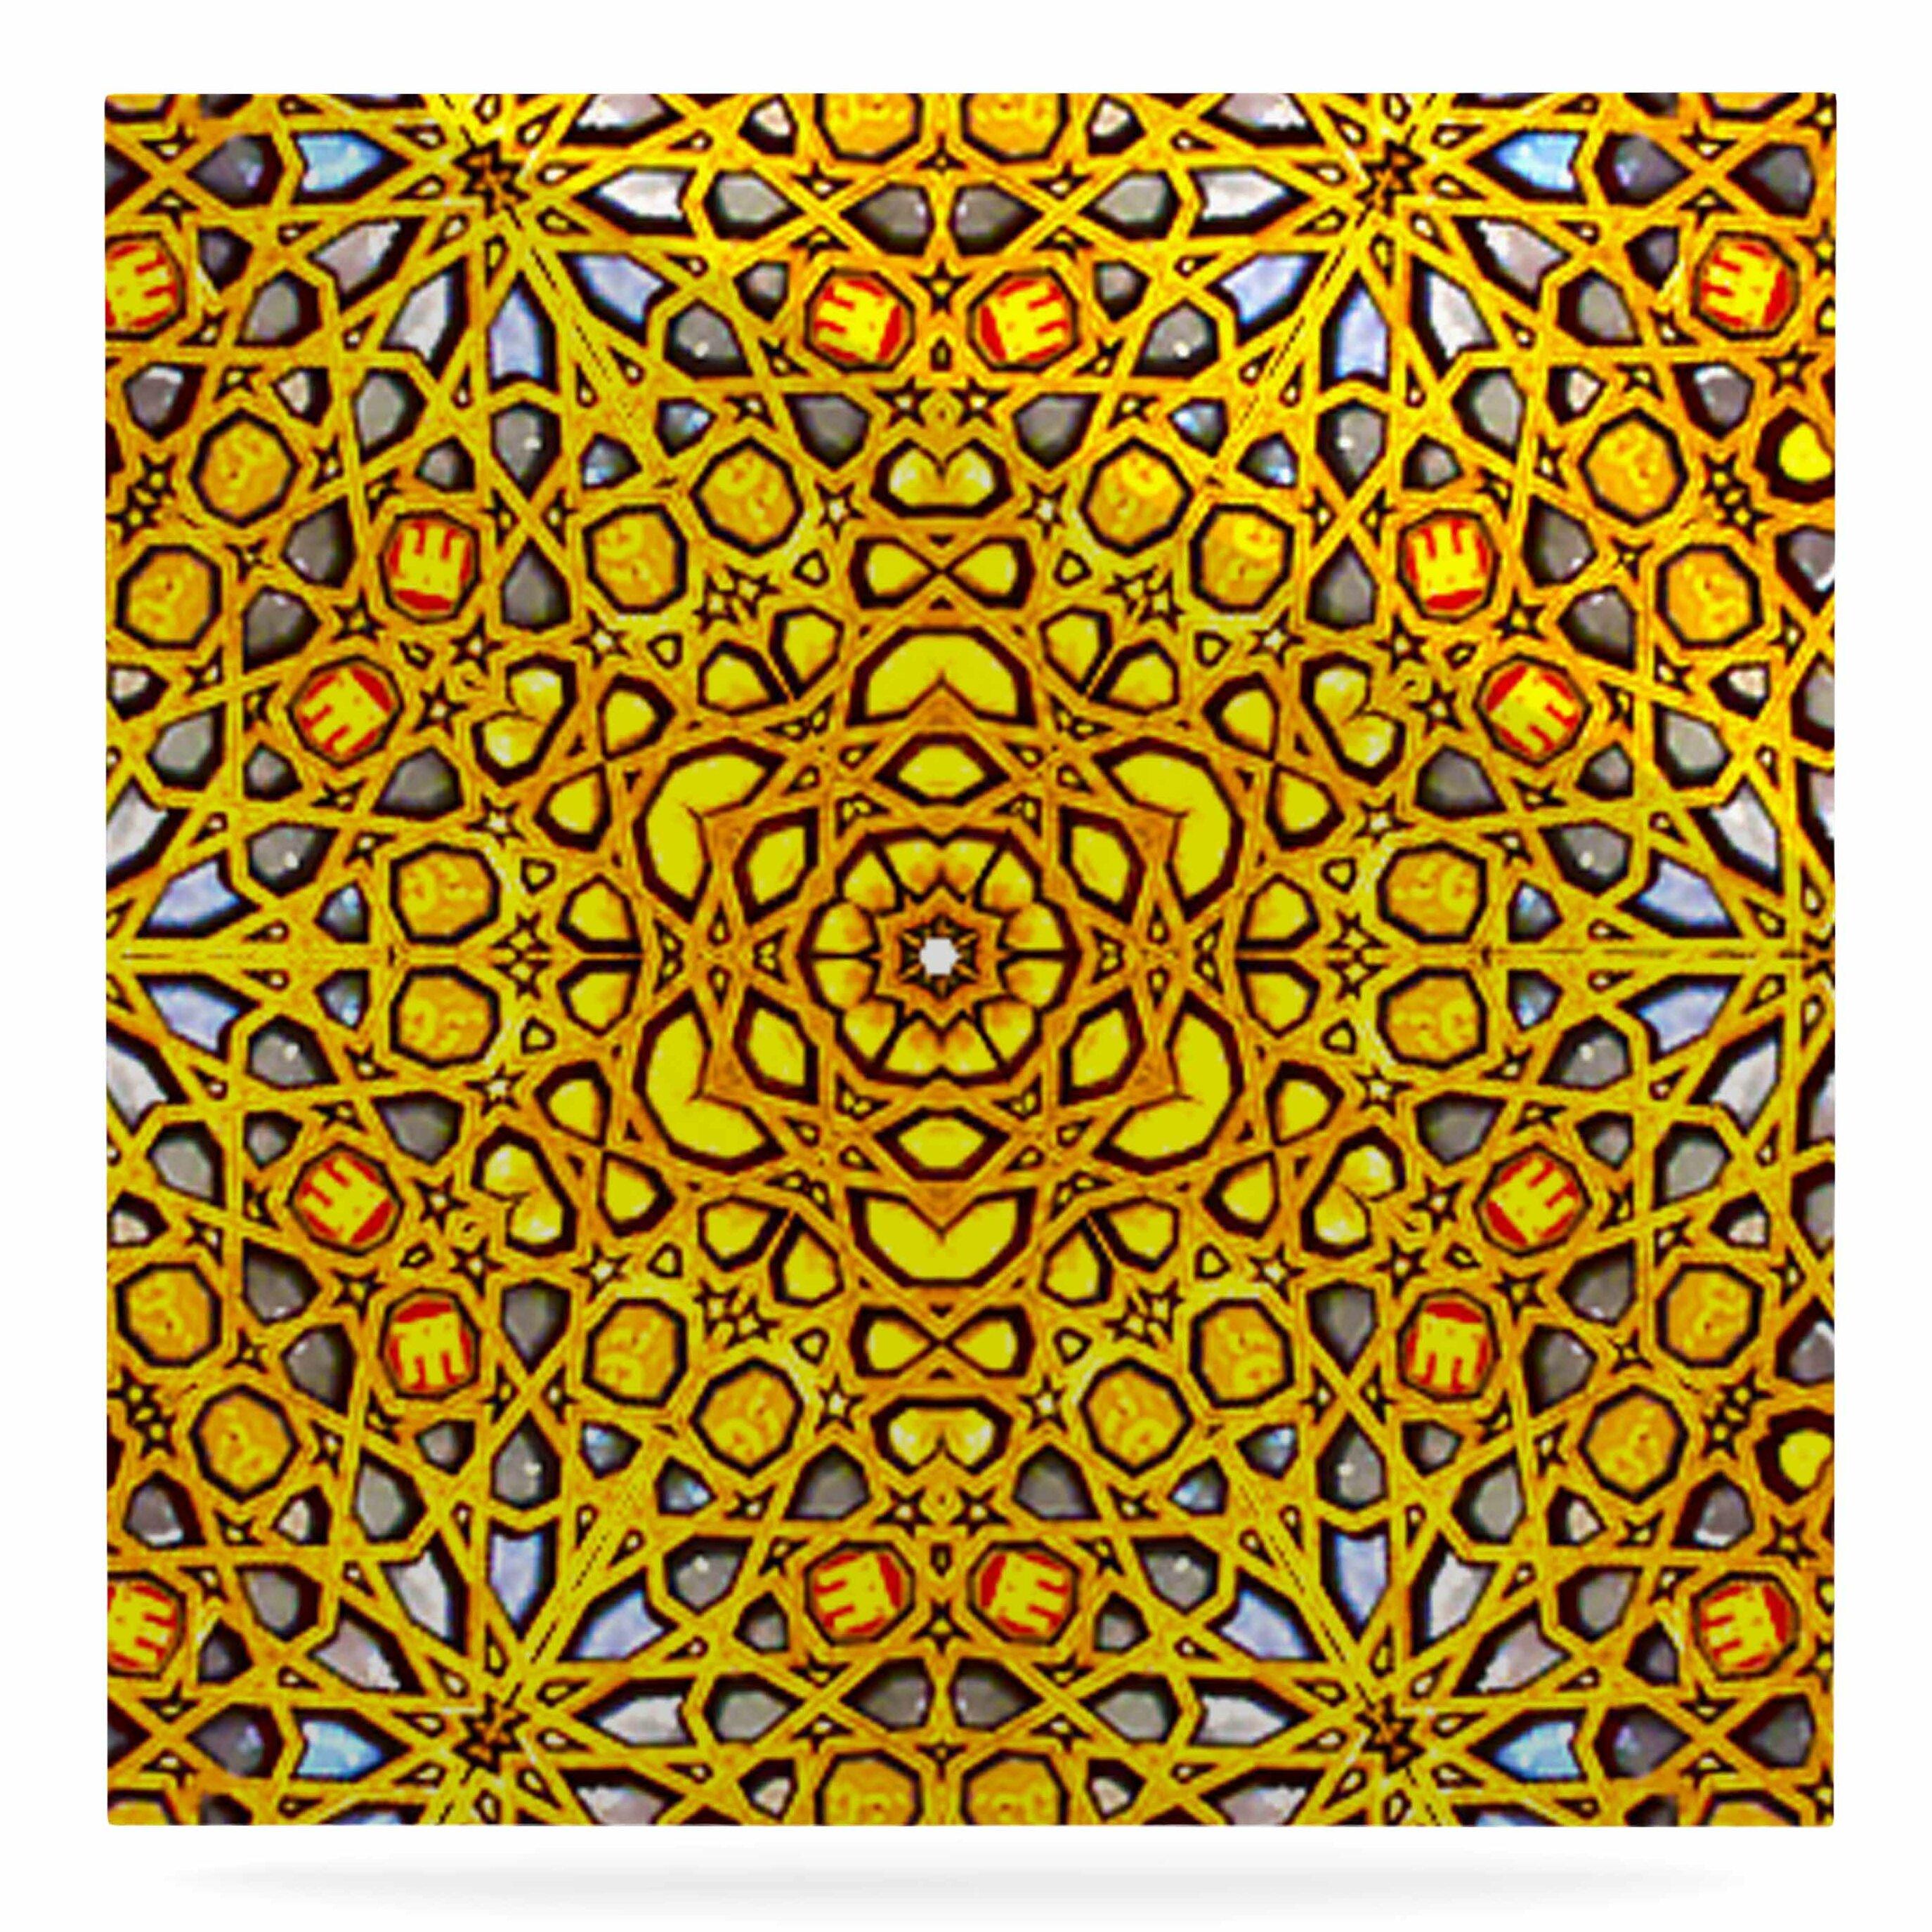 East Urban Home \'Golden Kaleidoscope\' Graphic Art Print on Metal ...